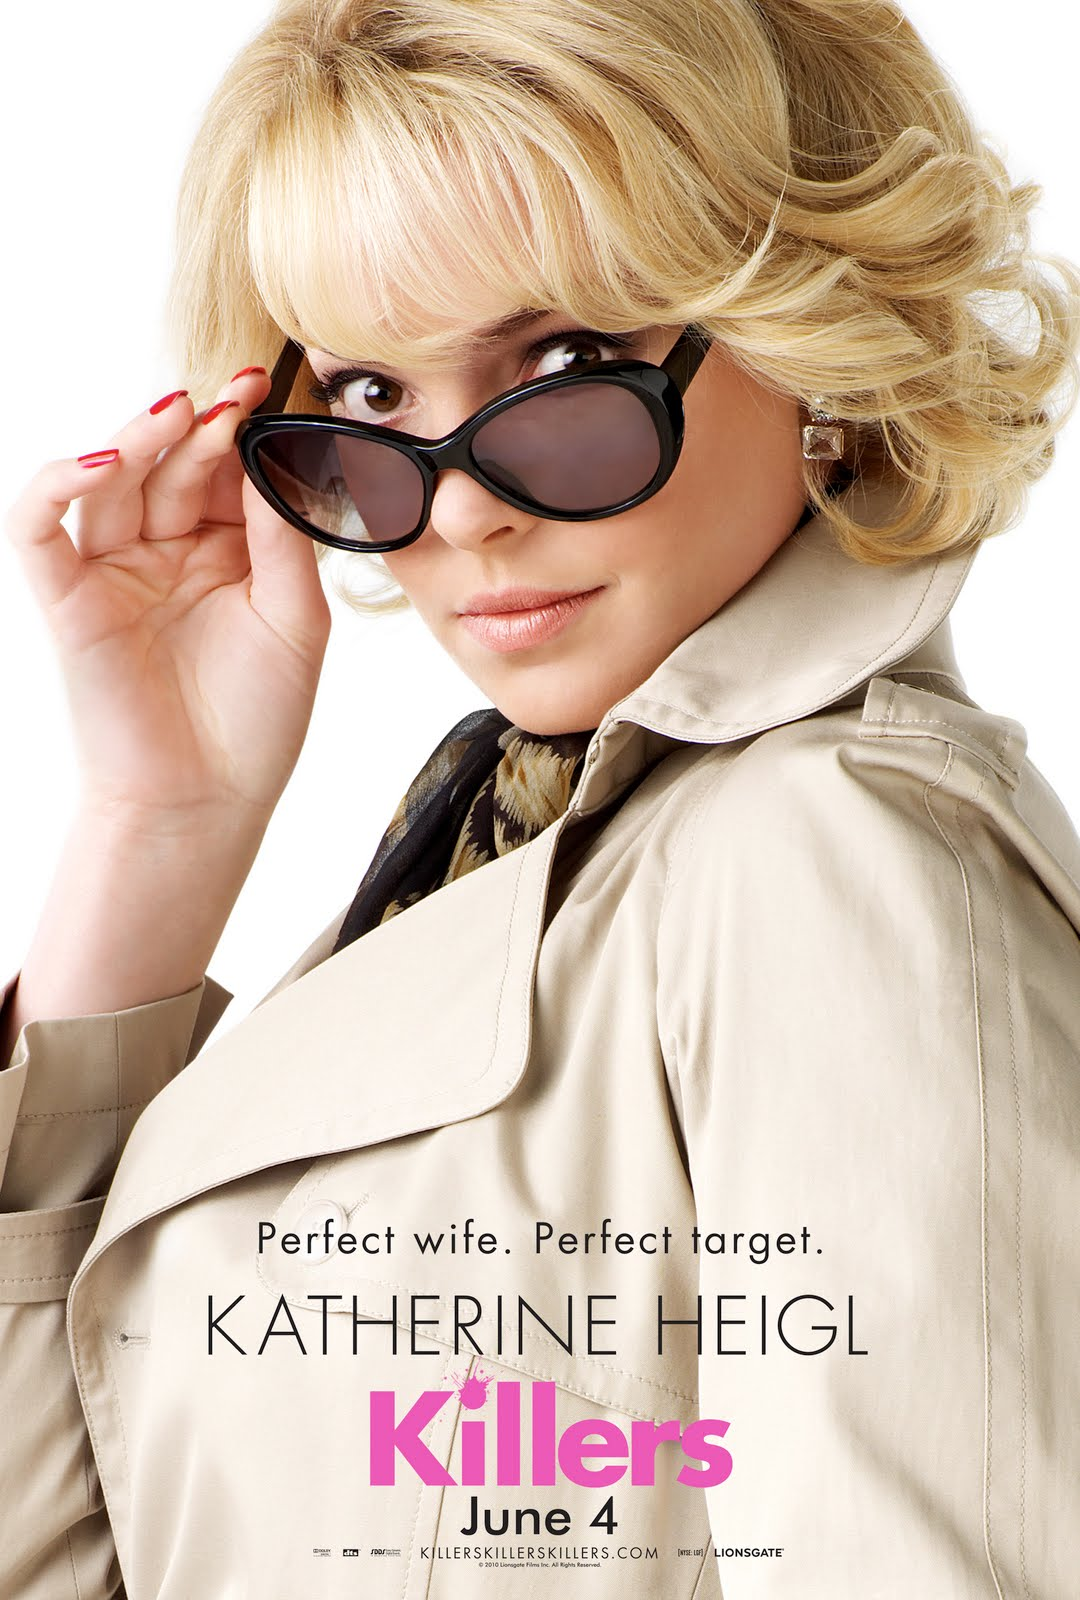 http://4.bp.blogspot.com/_--TF2cO1gOA/S7aarU8KEBI/AAAAAAAAAVI/d82ZuxLoVYc/s1600/Killers_Poster_Heigl.jpg